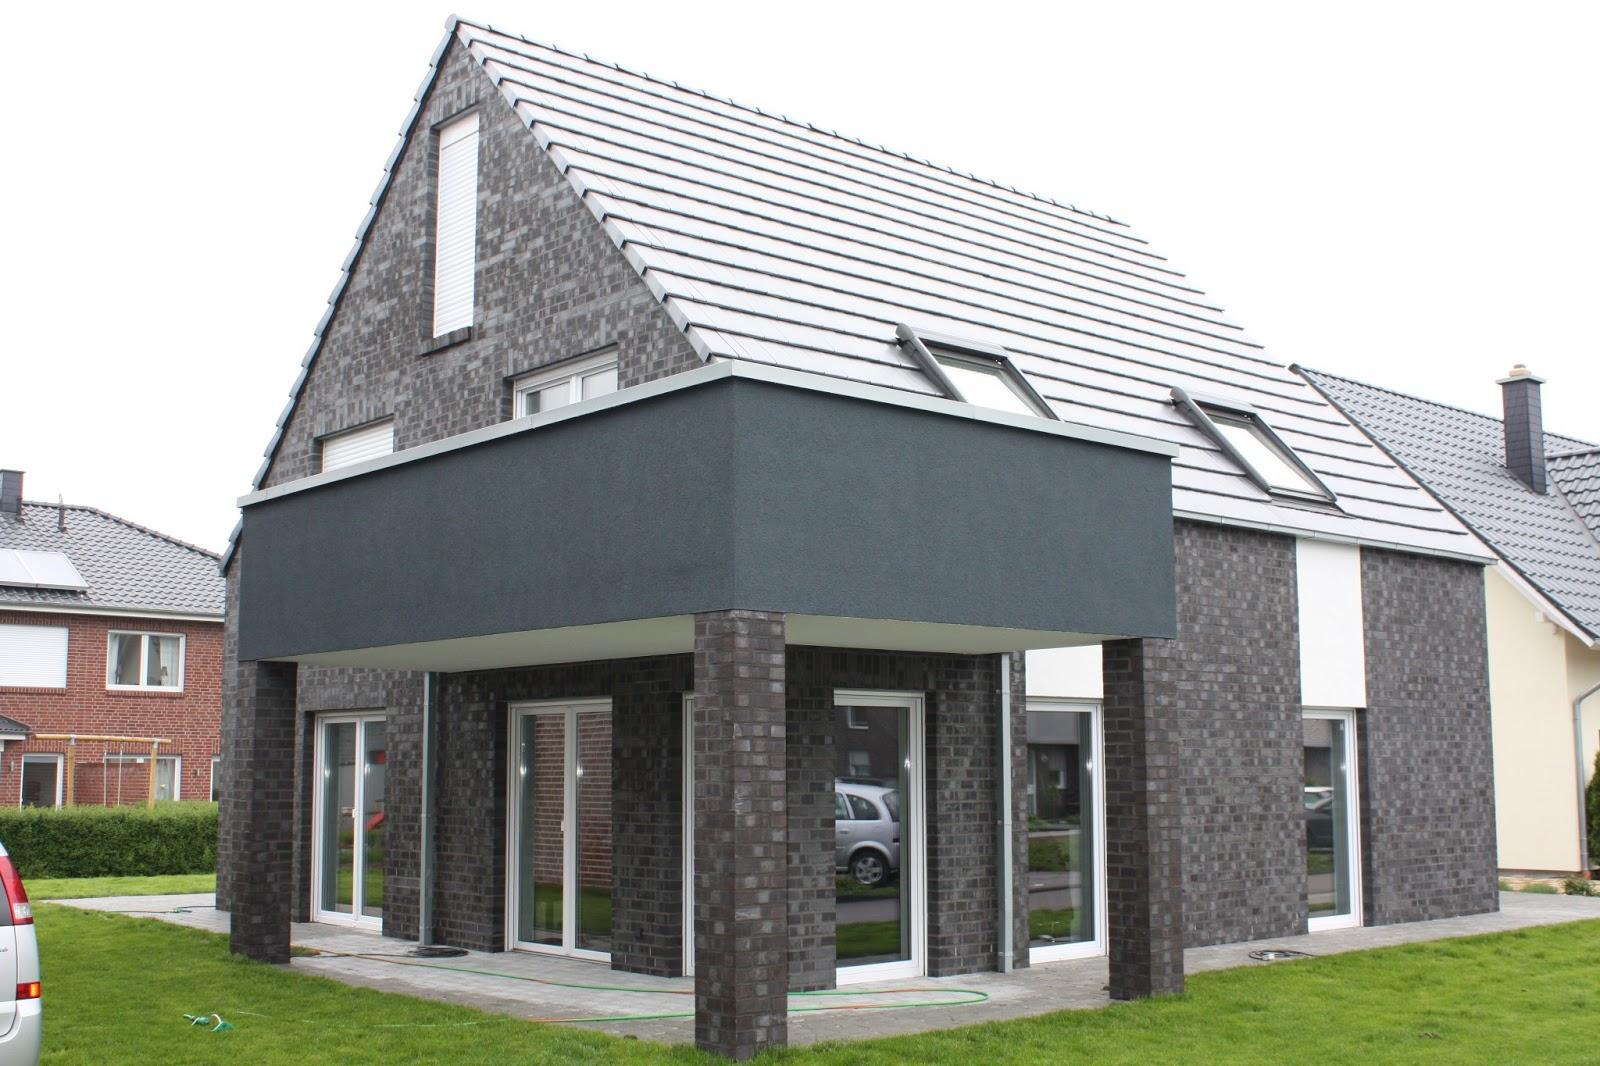 kfw 55 massivhaus ziegel massivhaus massivh user kfw 55. Black Bedroom Furniture Sets. Home Design Ideas